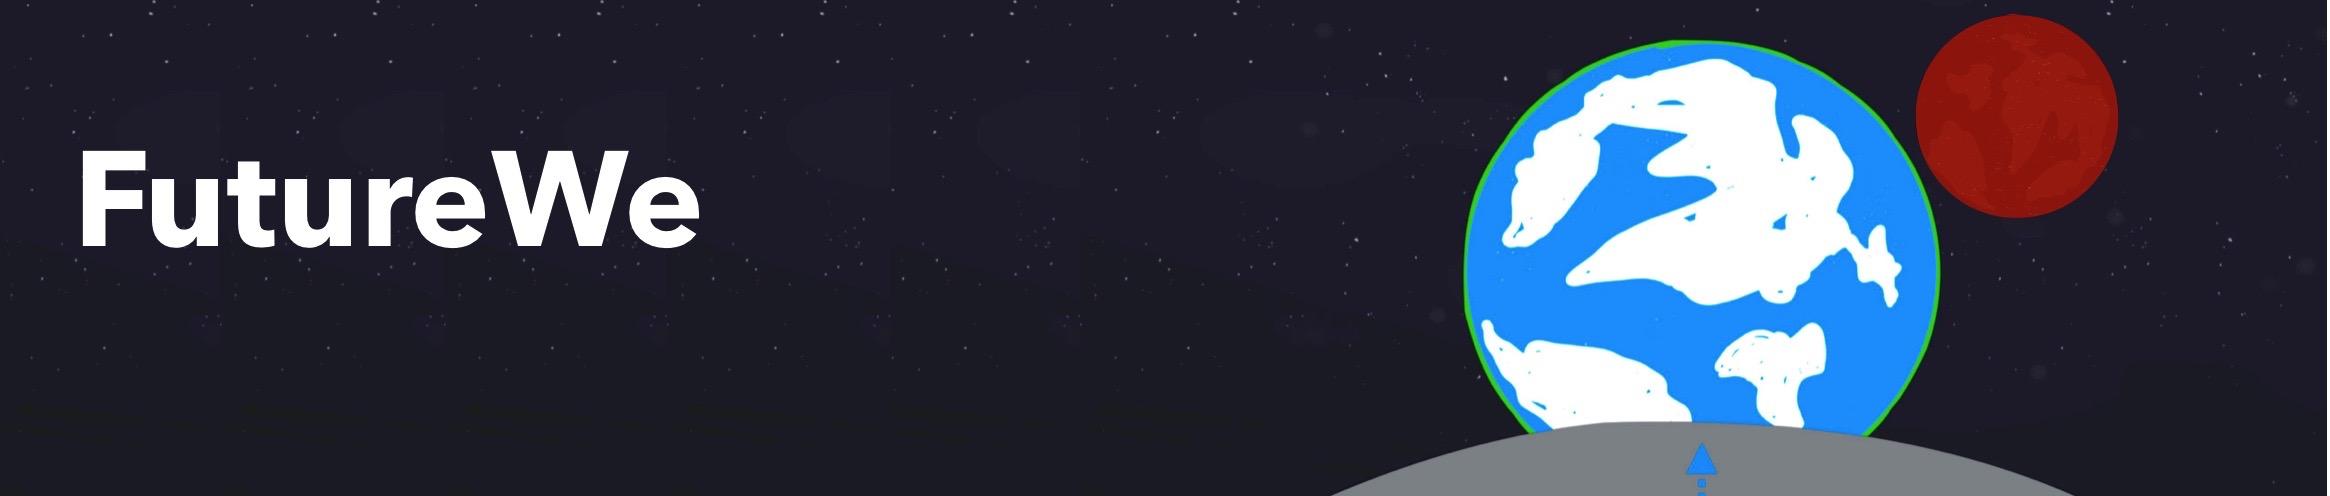 FutureWe banner sm.jpg